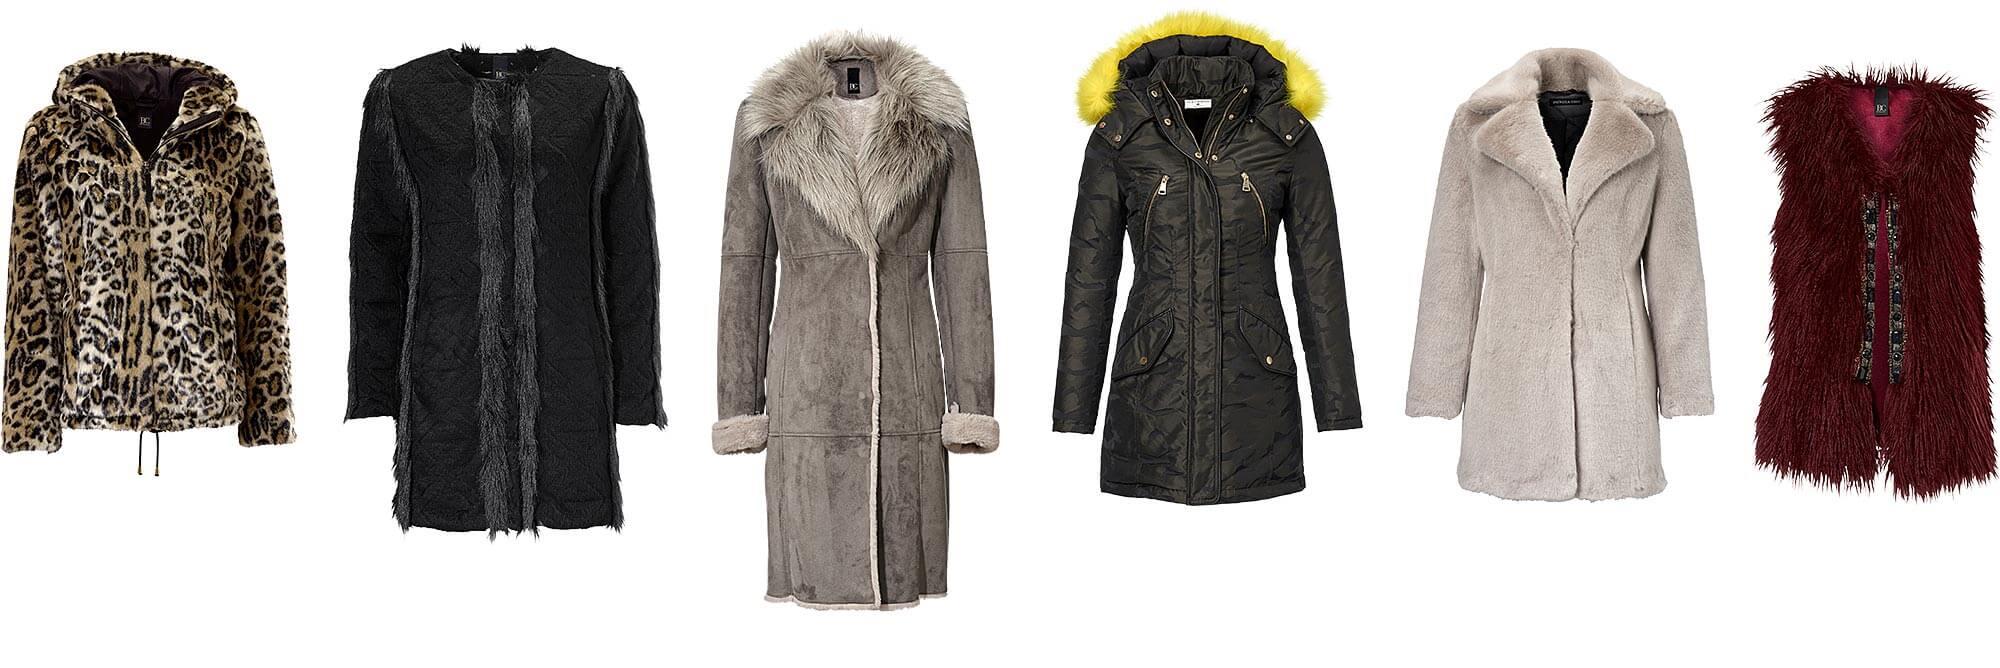 Fake Fur_outfit_dezember_Jacken_Mäntel